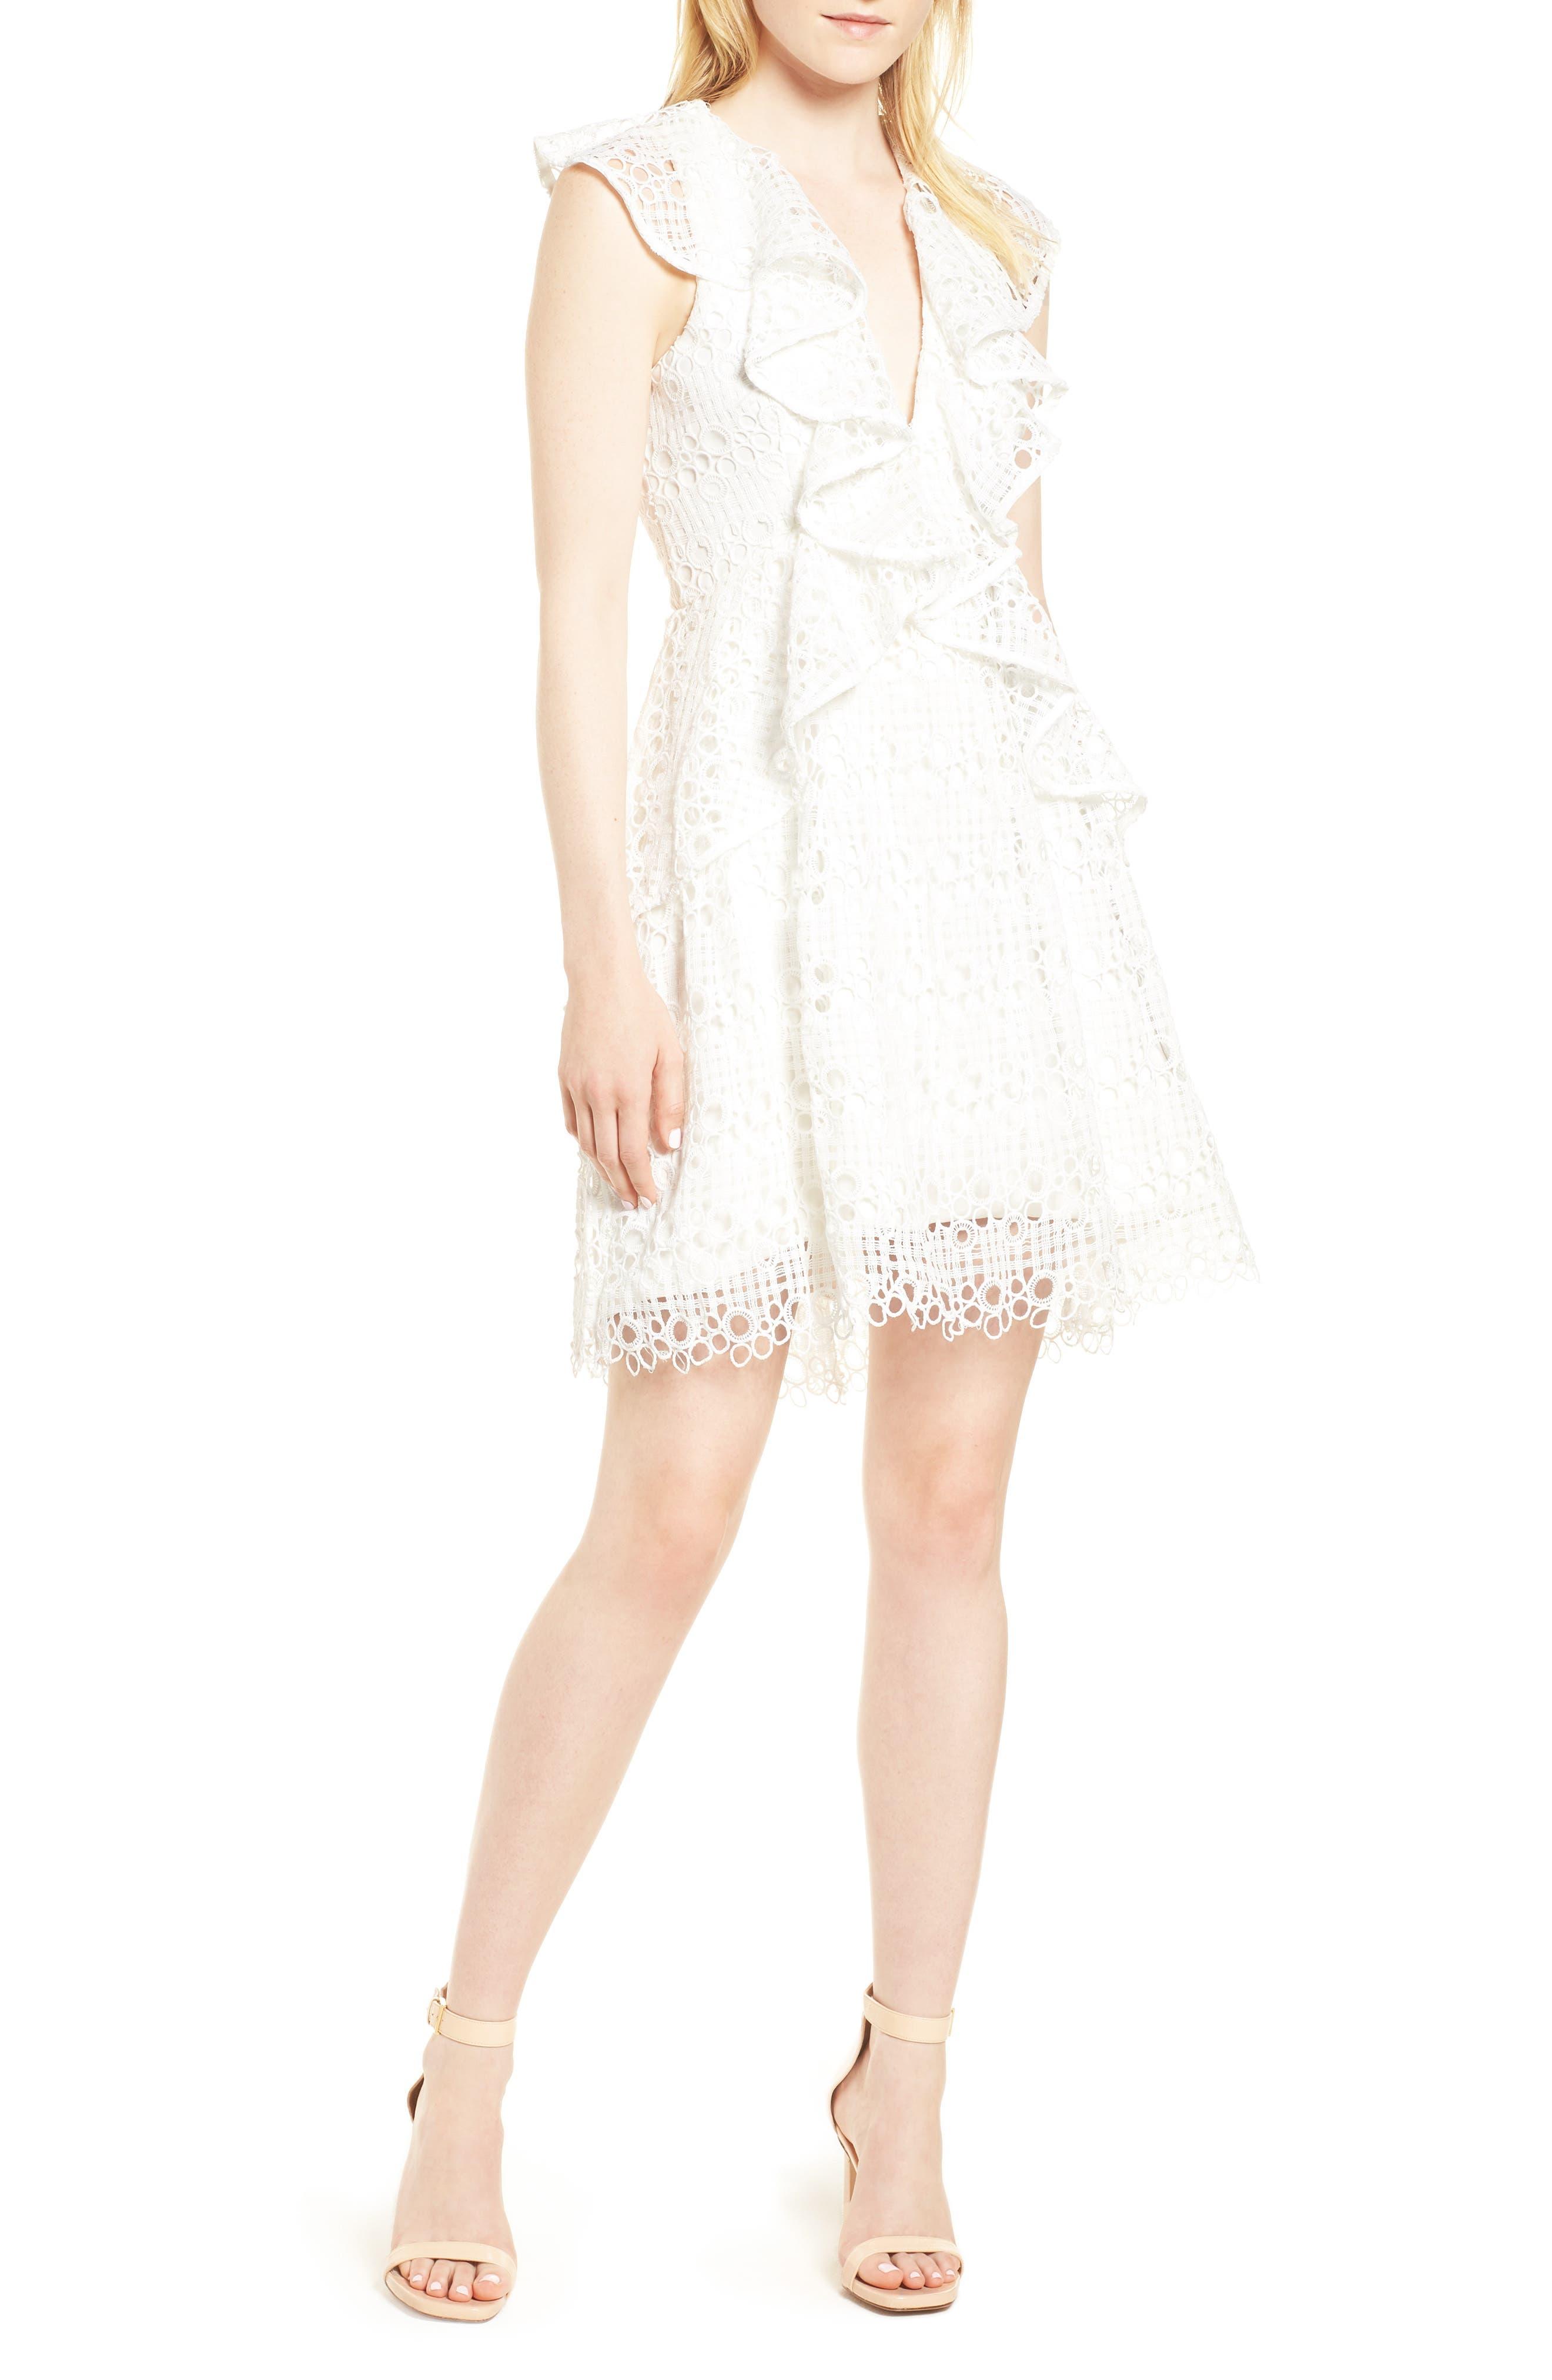 Interlude Dress,                             Main thumbnail 1, color,                             White